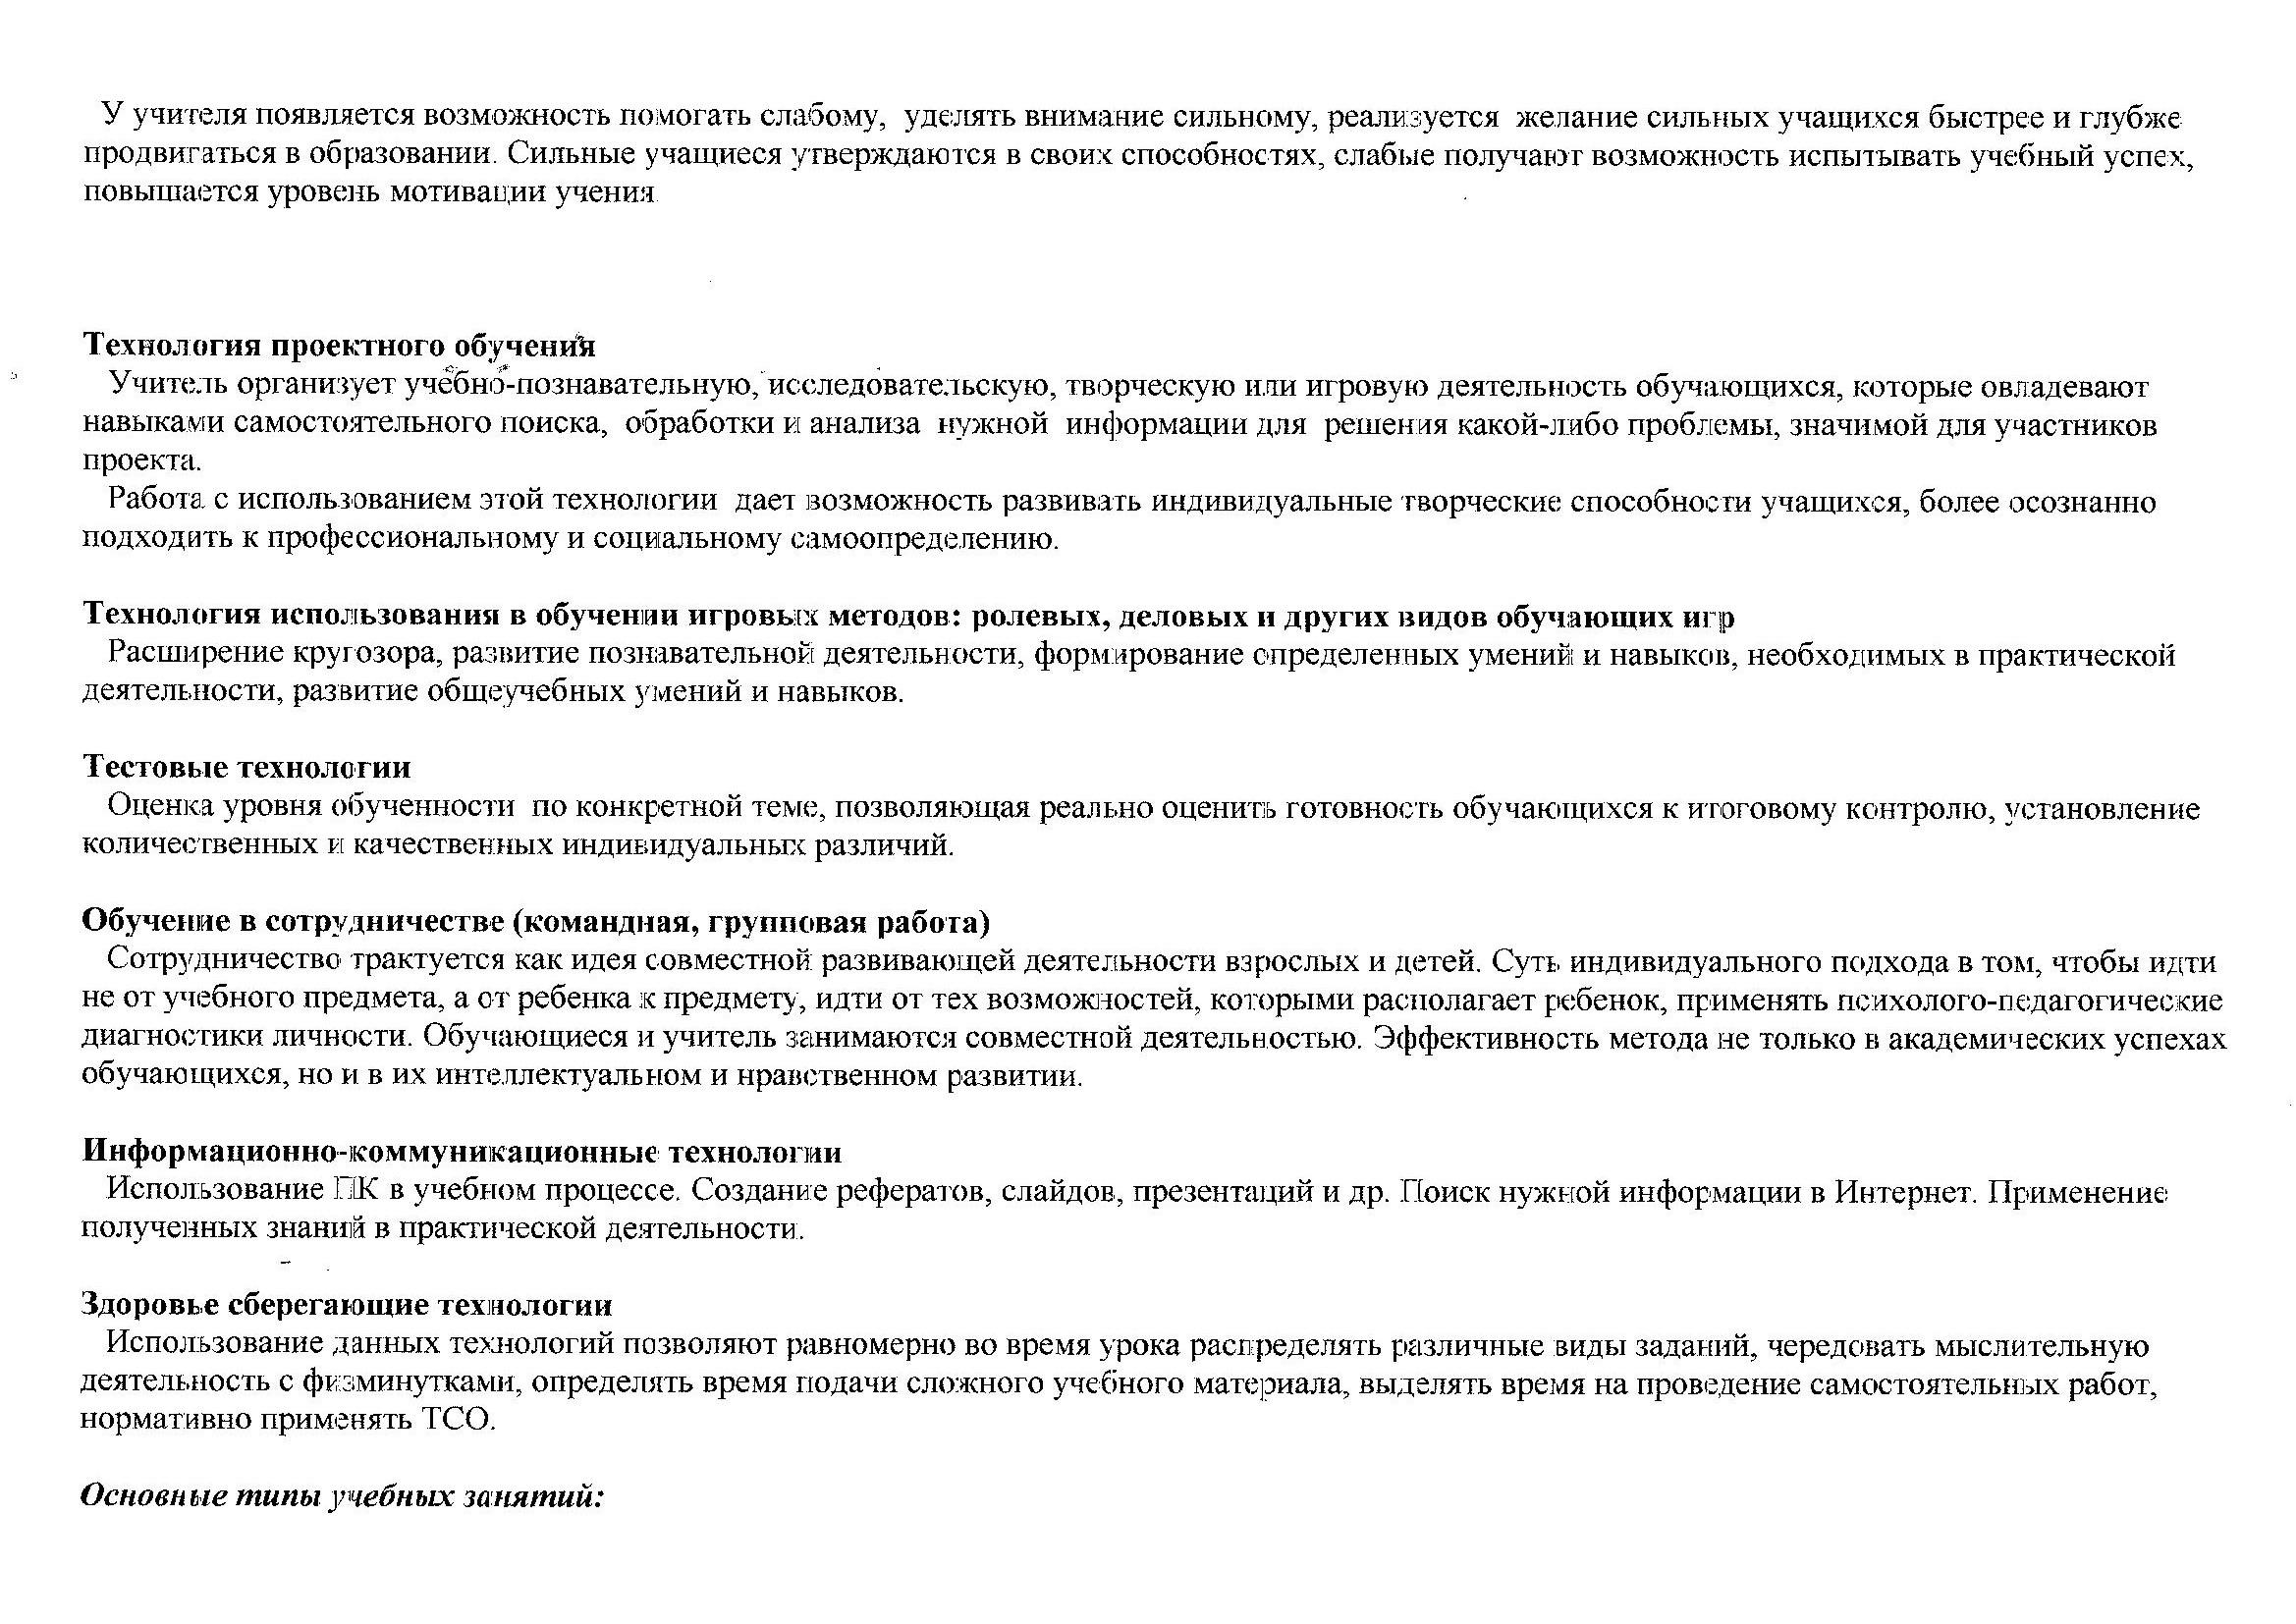 C:\Users\бакс\Documents\Scan0003.jpg